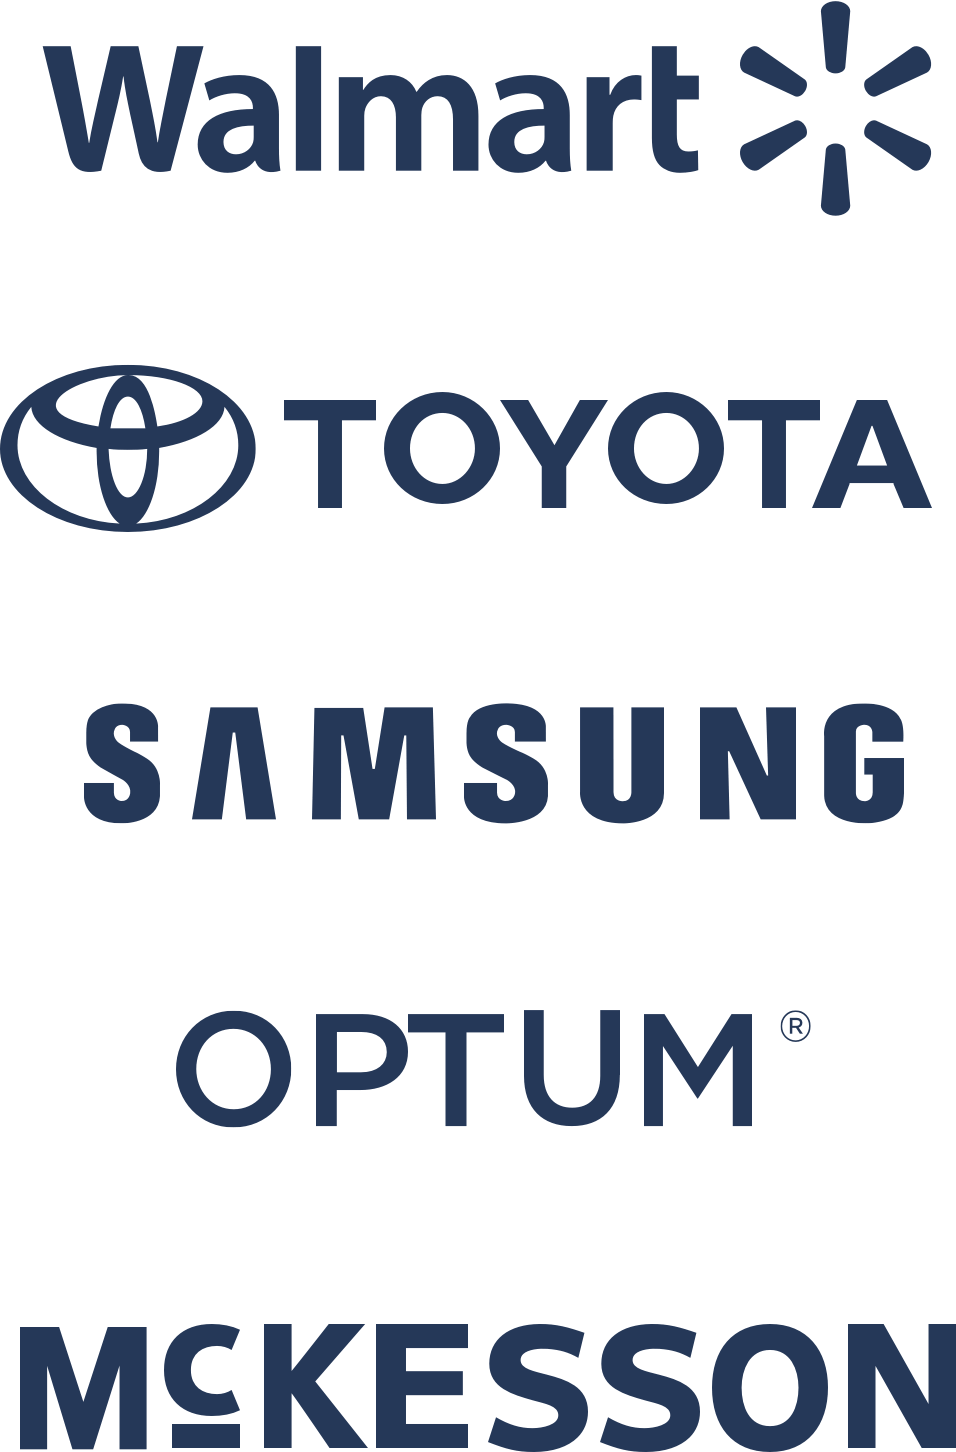 Logotipos da Walmart, da Toyota, da Samsung, da Optum e da McKesson